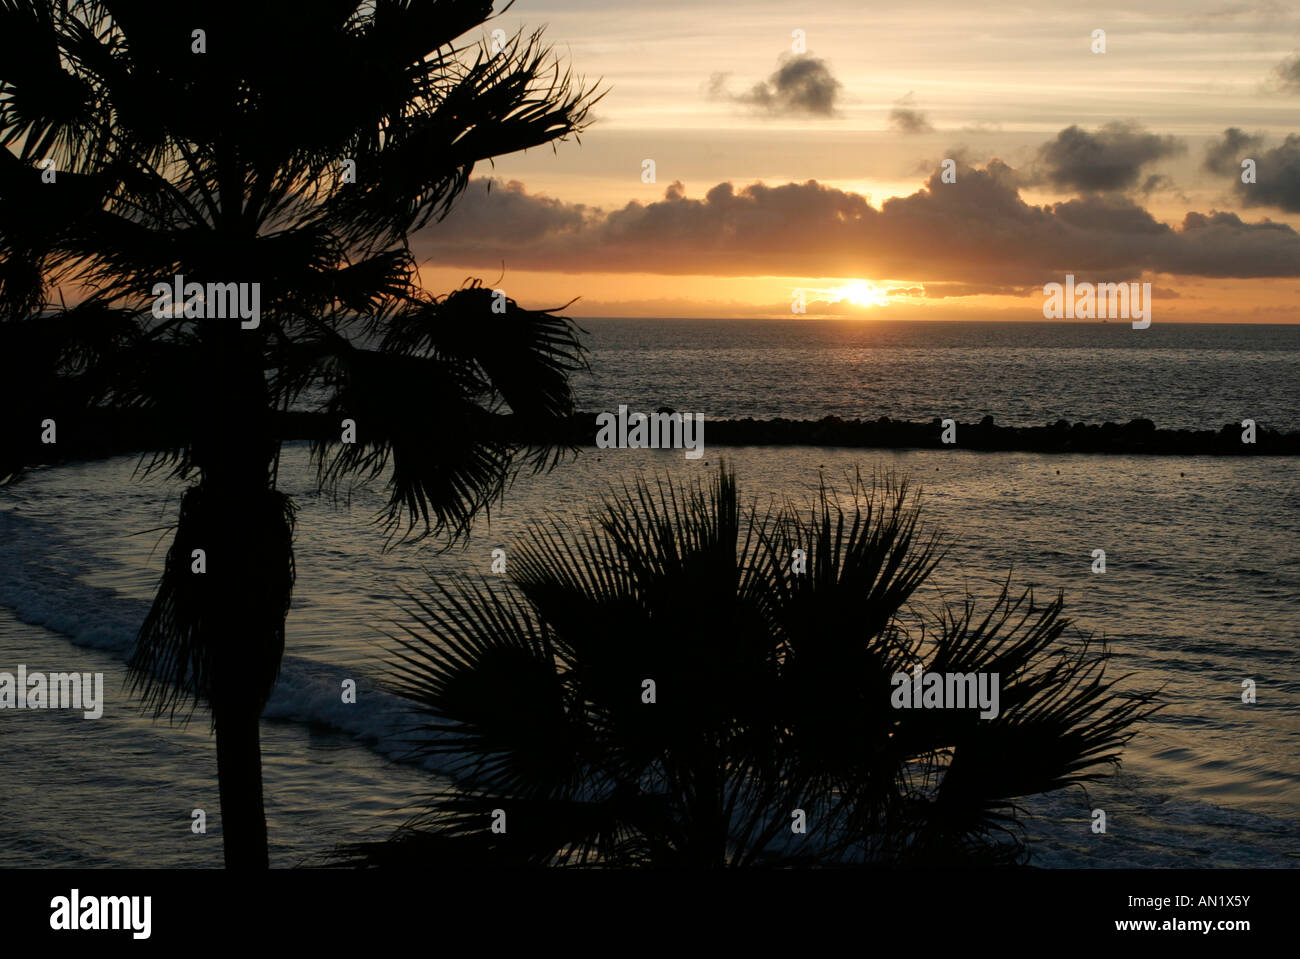 25 01 2004 Kanaren Teneriffa Sonnenuntergang am Playa de las Americas Stock Photo